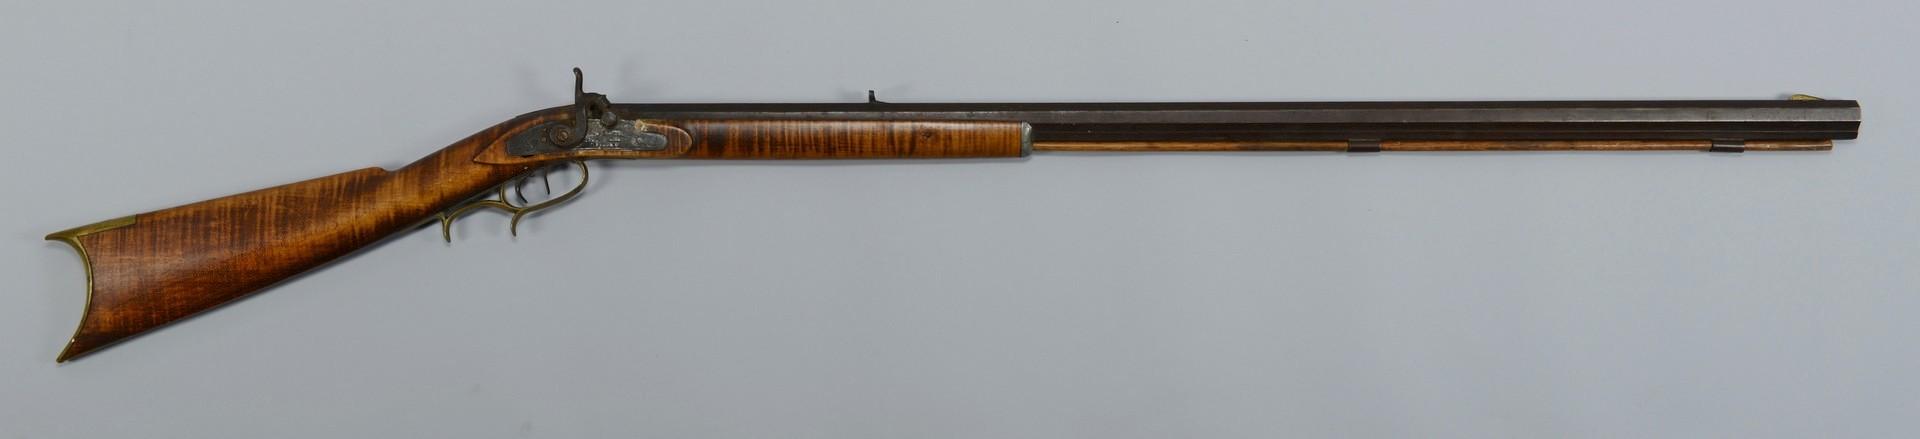 Lot 398: Half Stock Percussion Rifle